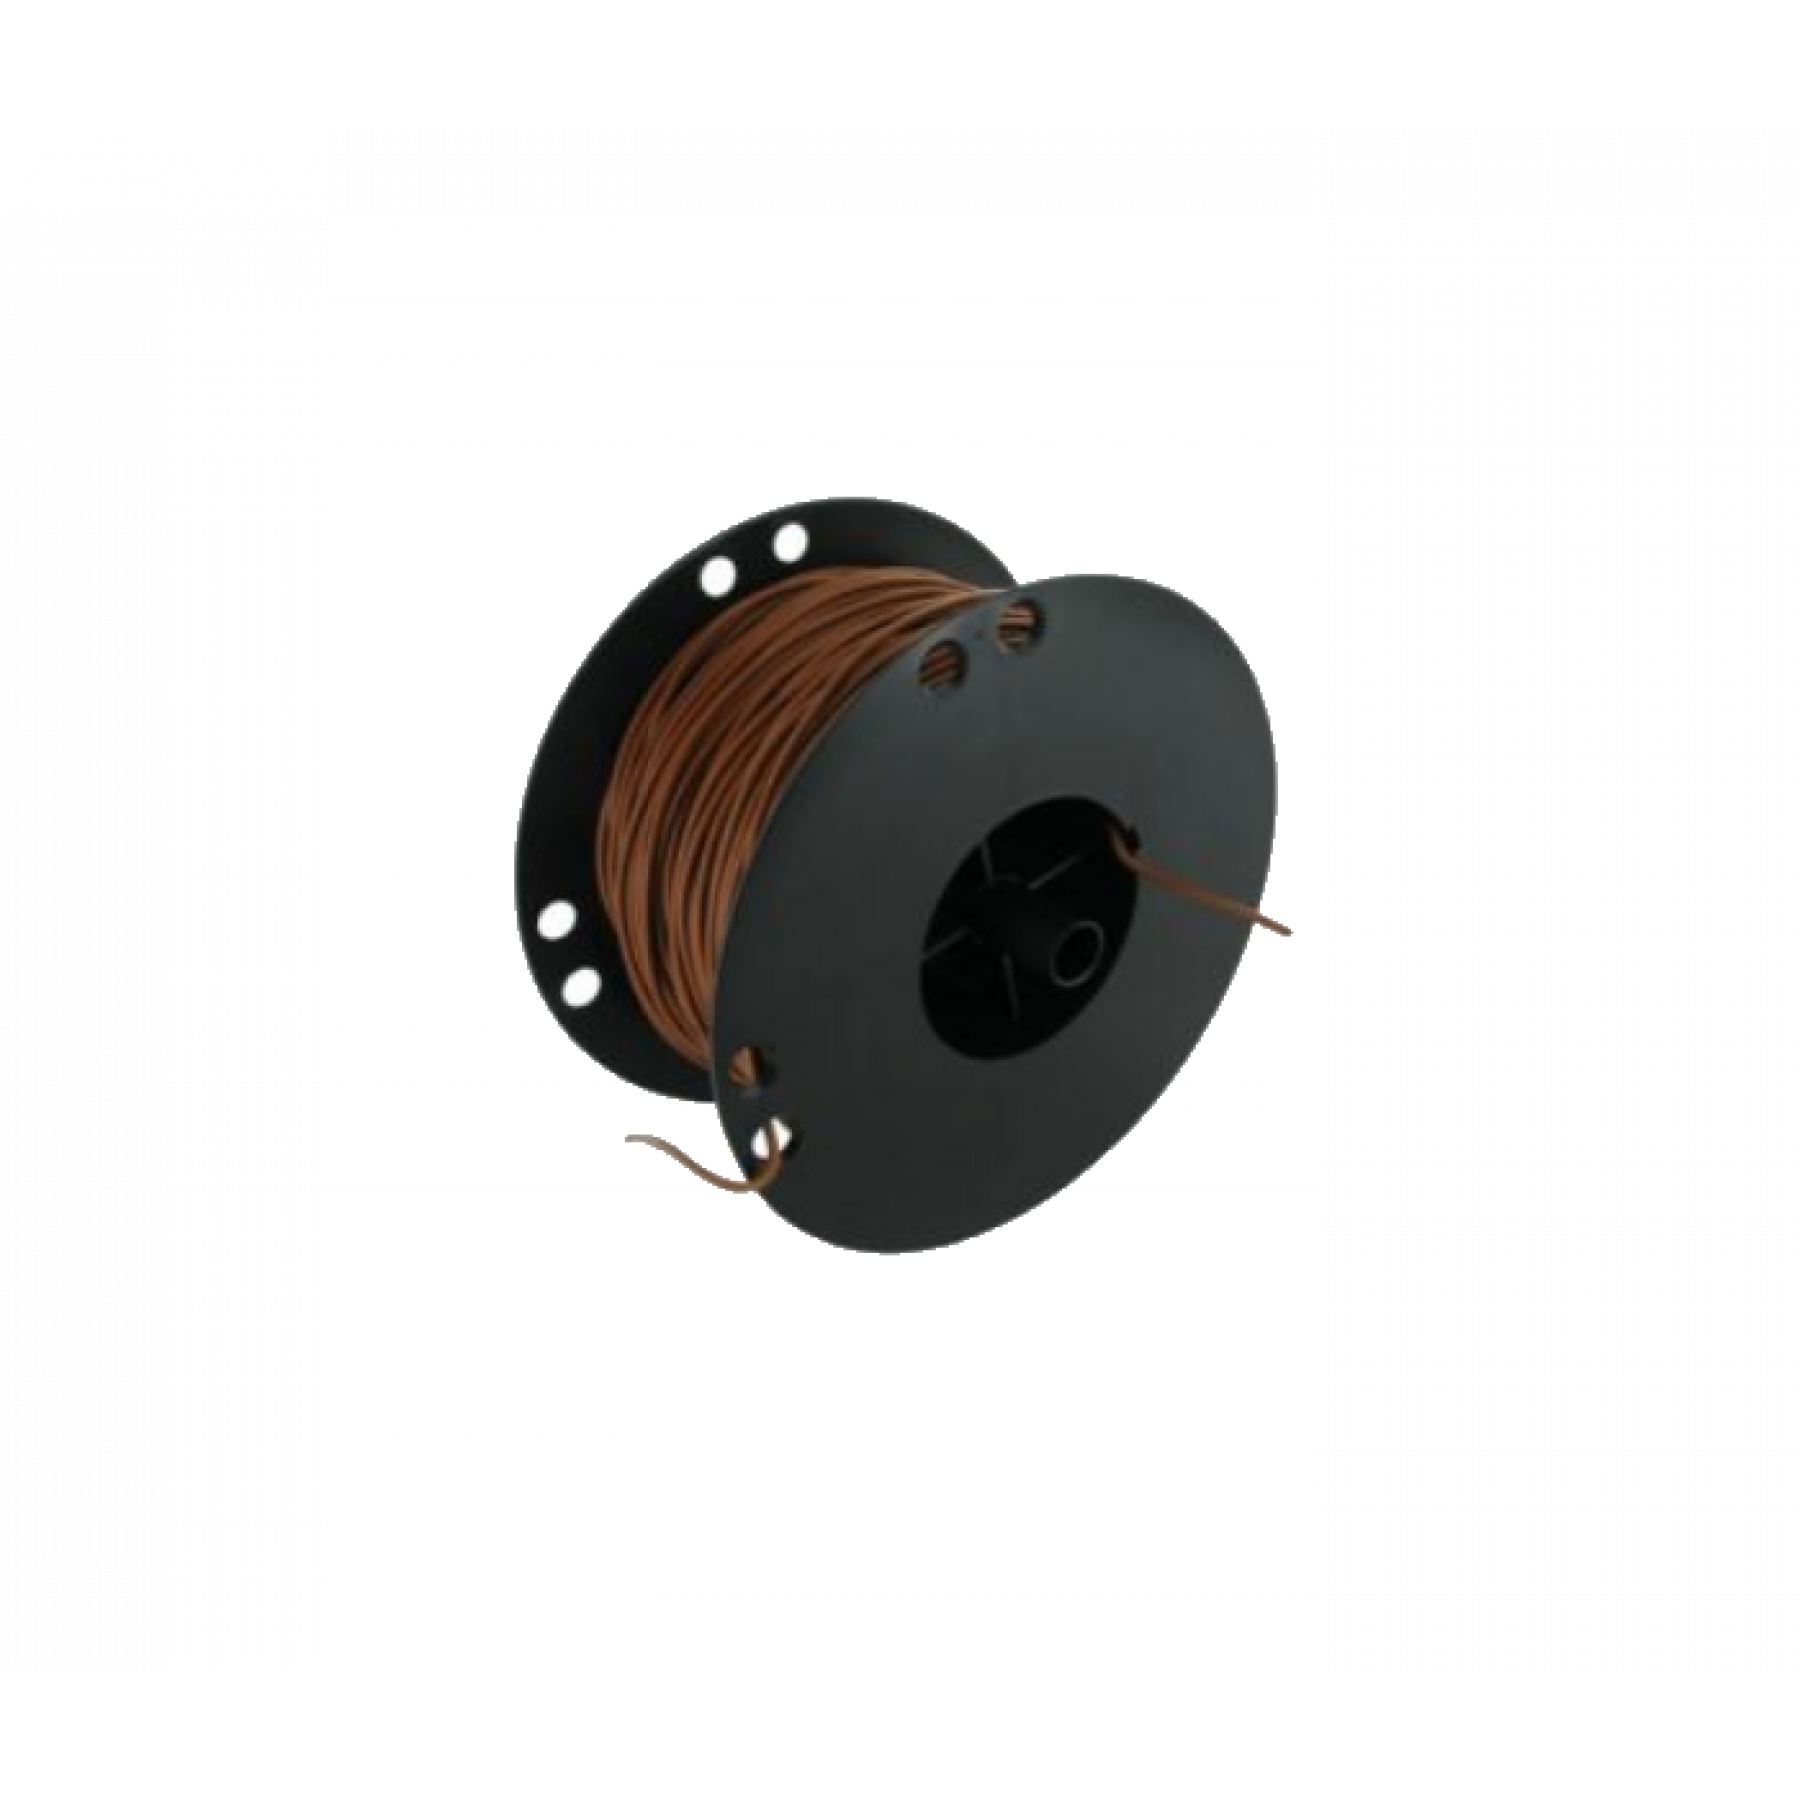 Kabel 0,75 bruin 100 mtr. haspel